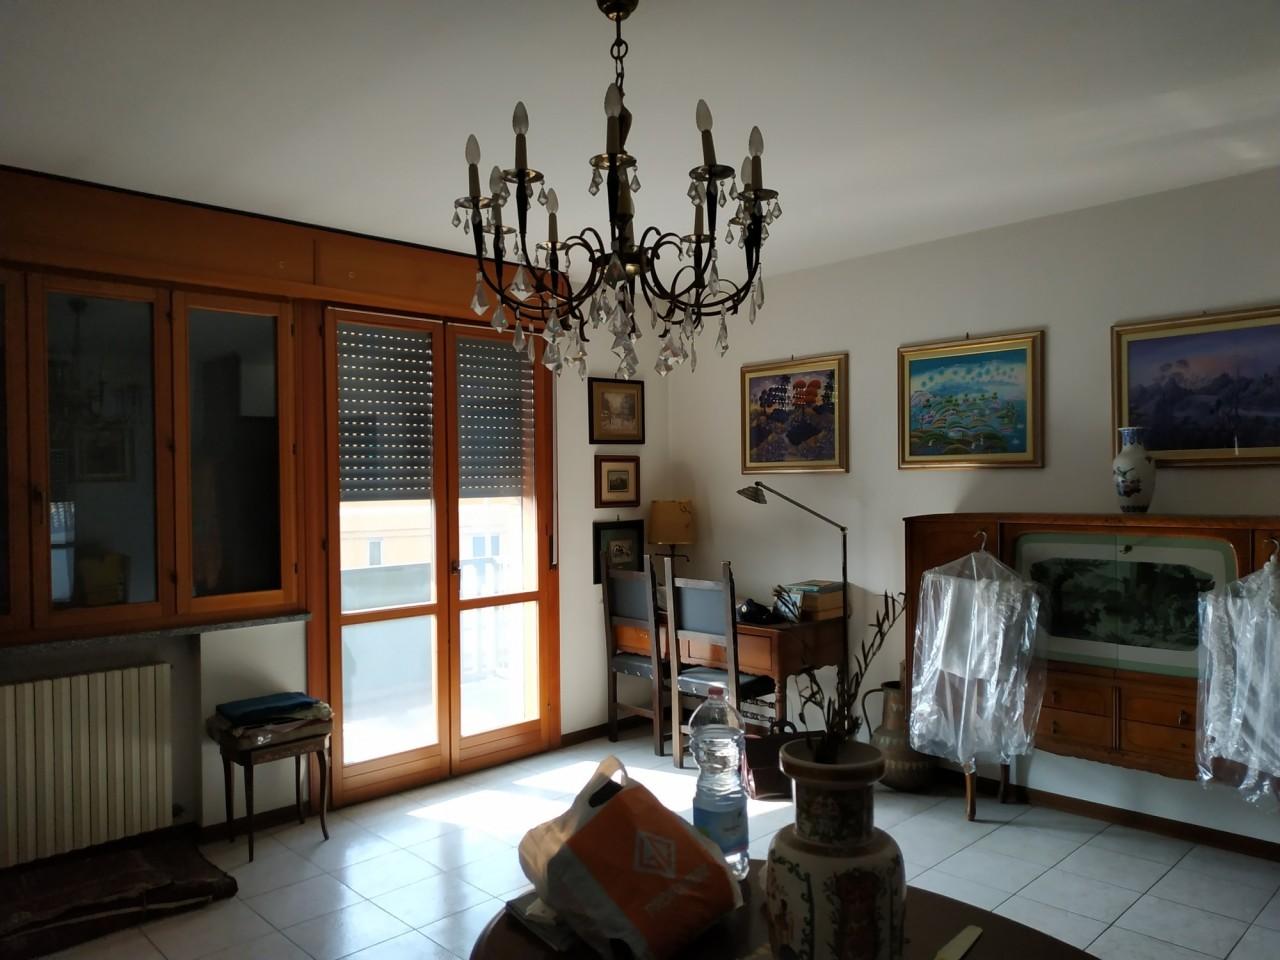 Appartamento - Bilocale a Parma